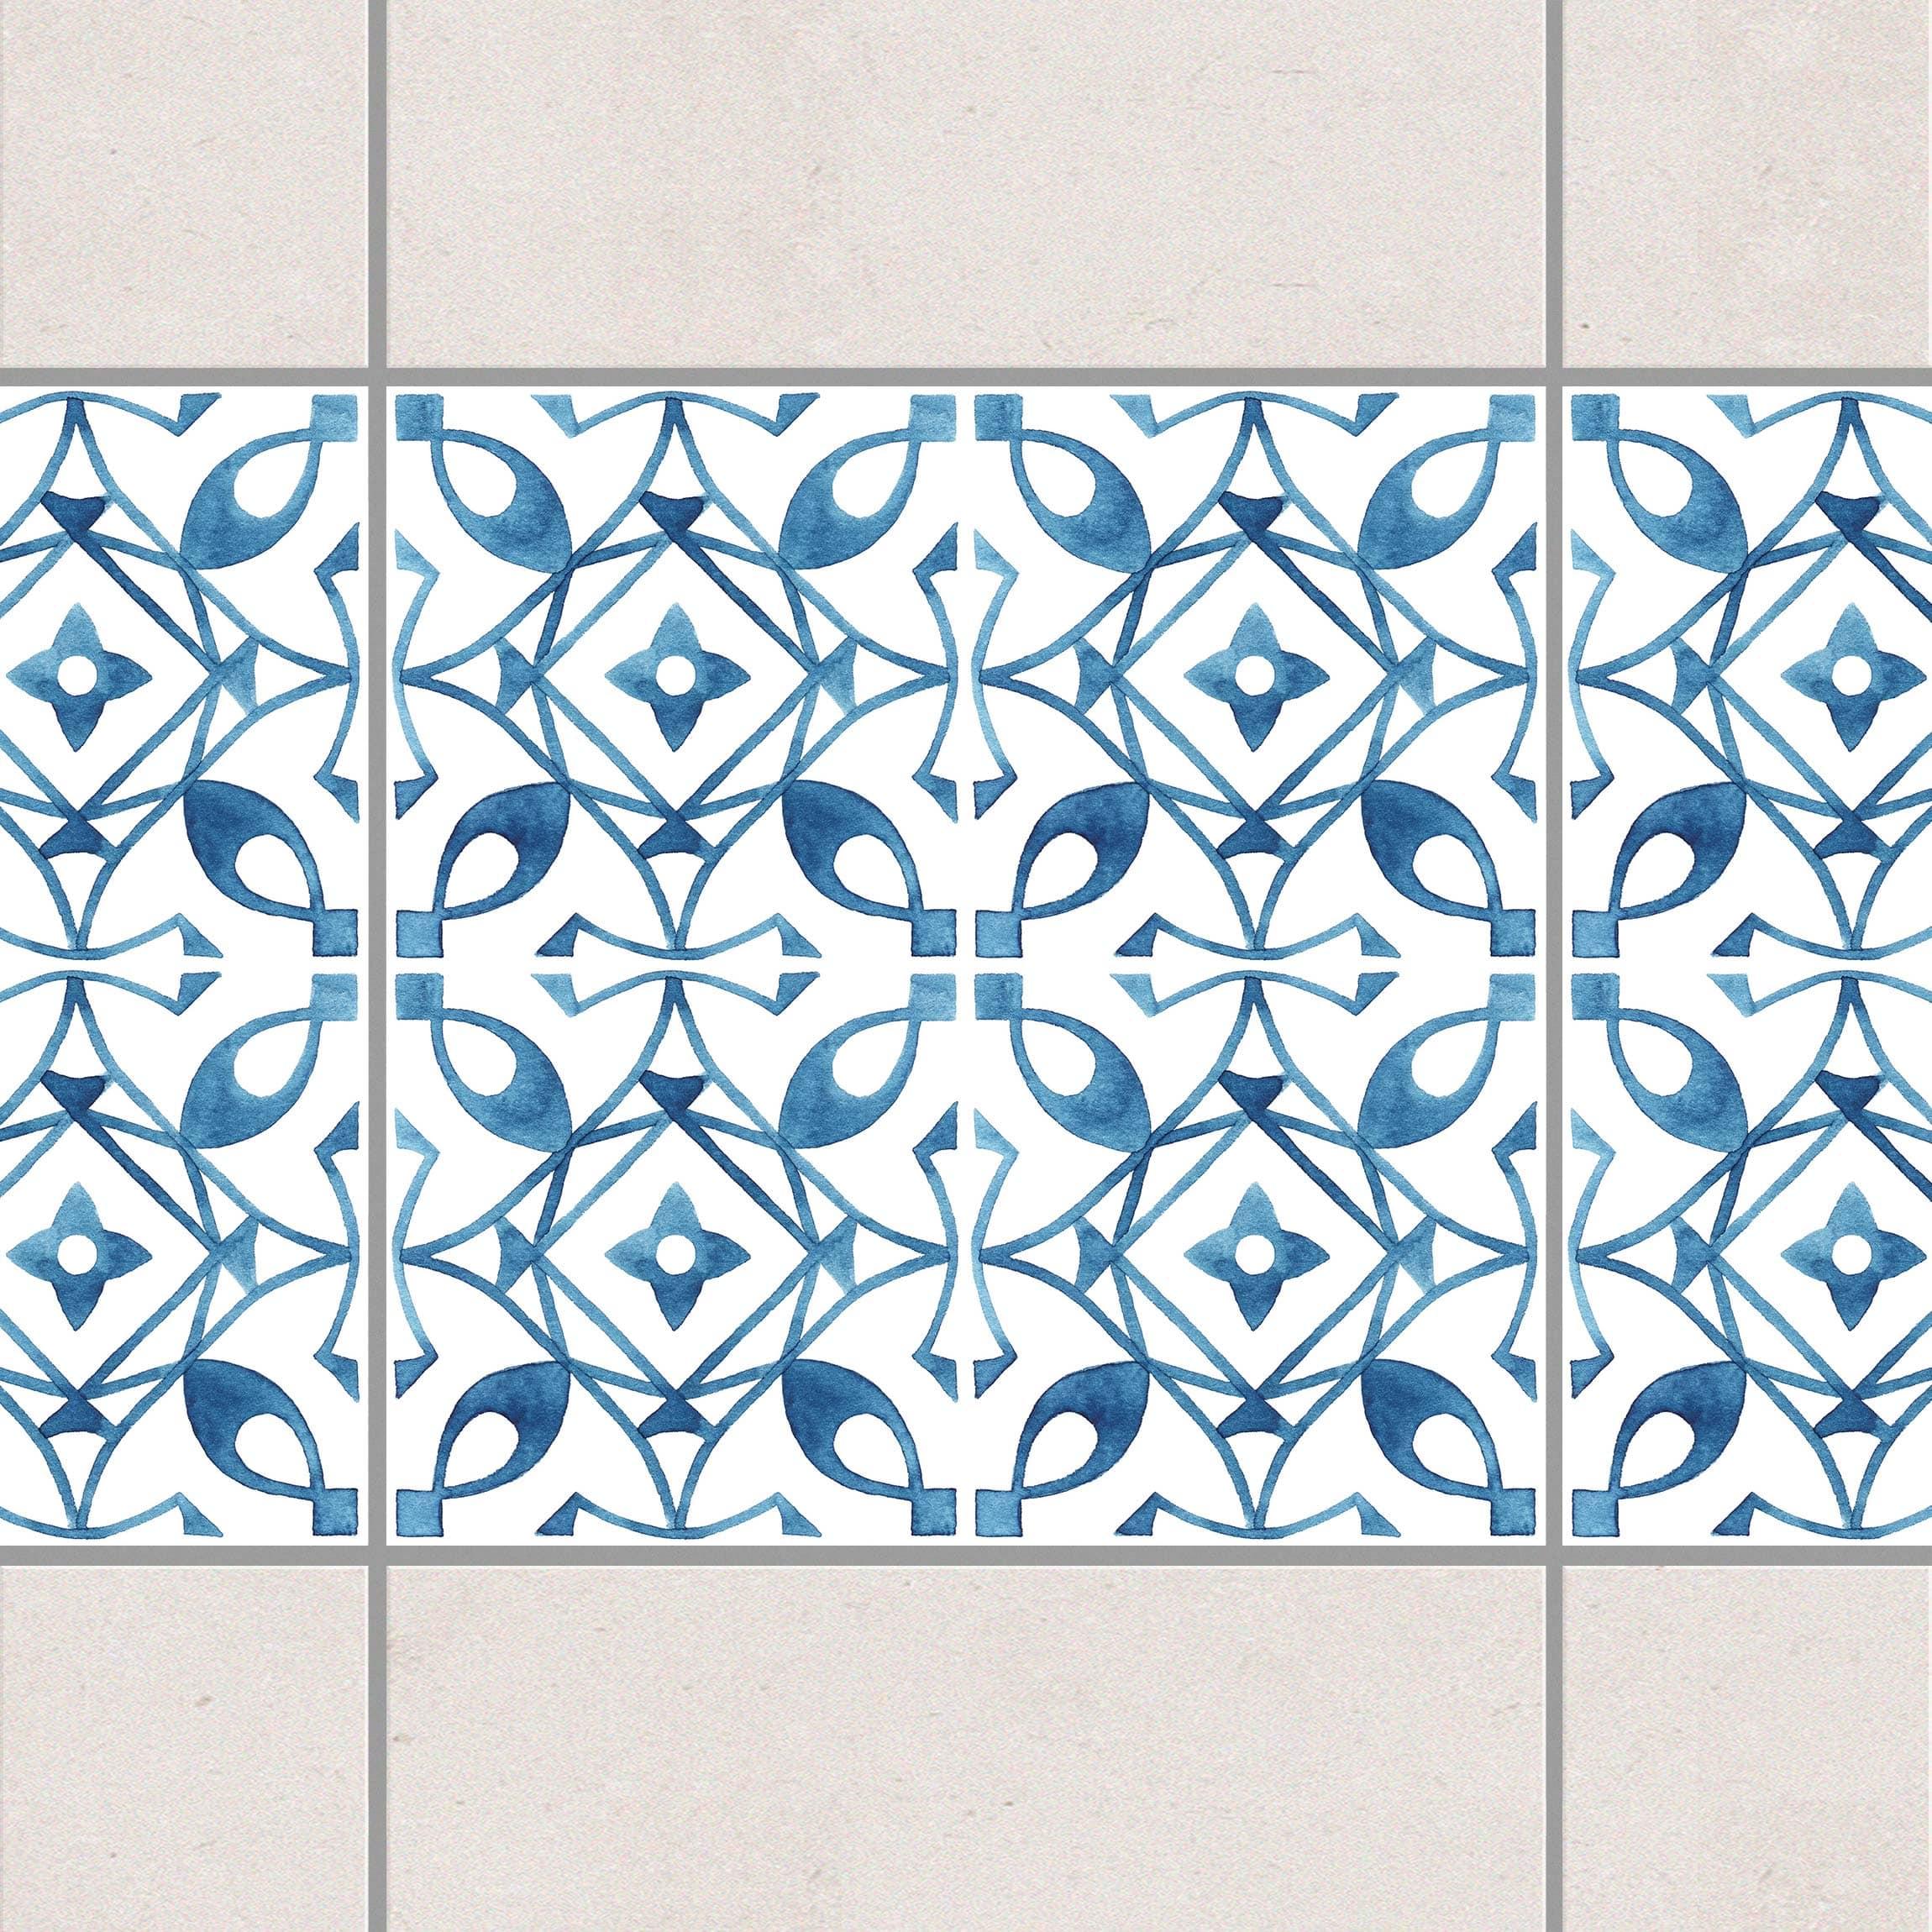 fliesen bord re blau wei muster serie no 8 1 1 quadrat 10cm x 10cm fliesenaufkleber. Black Bedroom Furniture Sets. Home Design Ideas